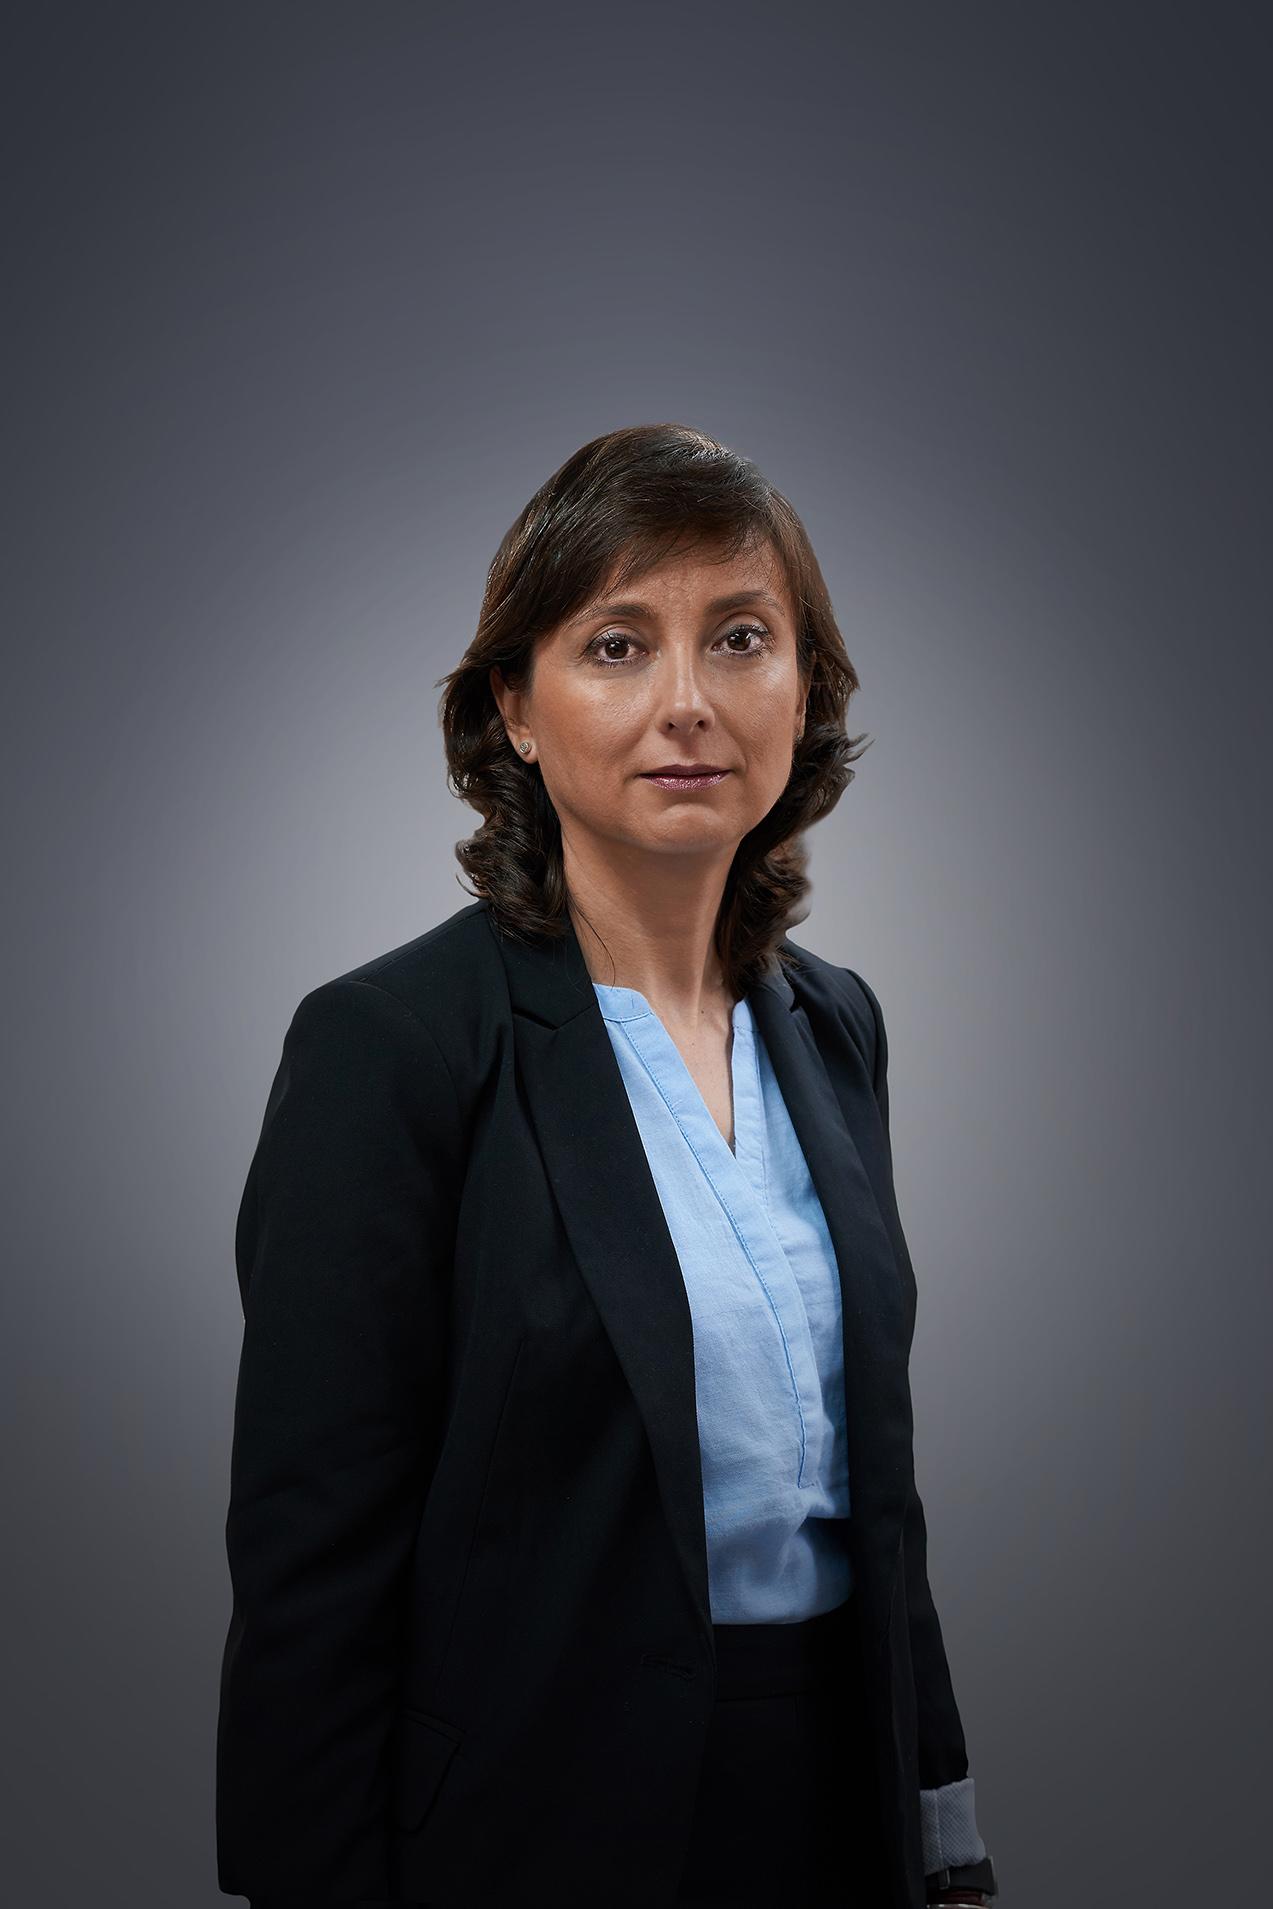 Inma Soriano Valls